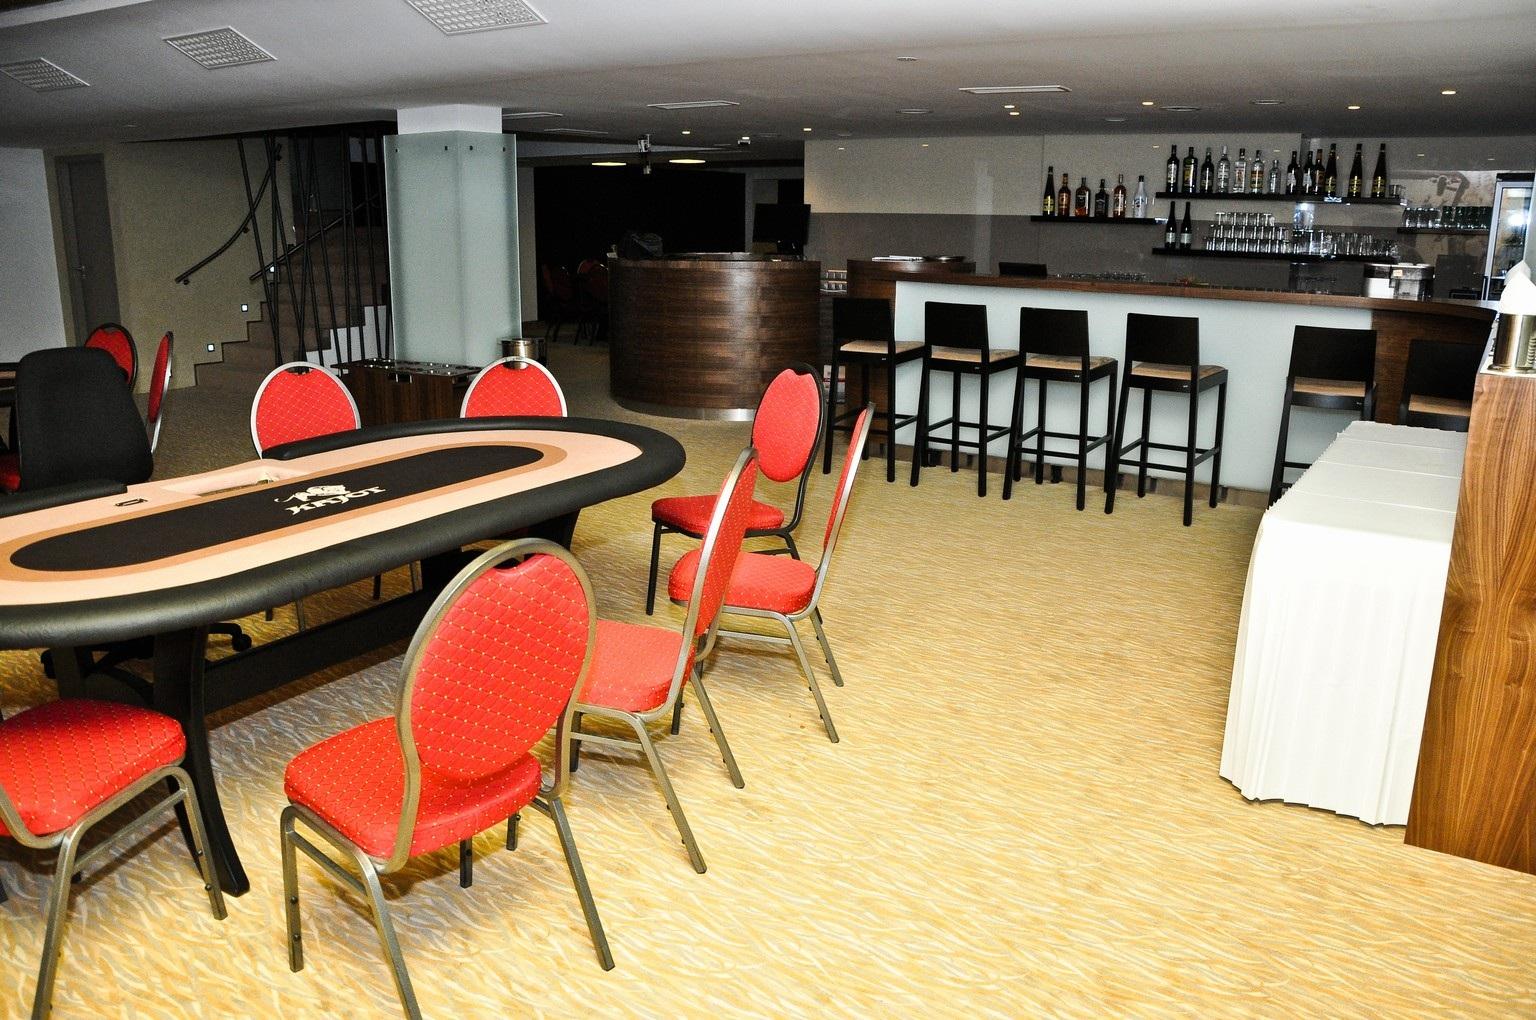 Poker club kajot